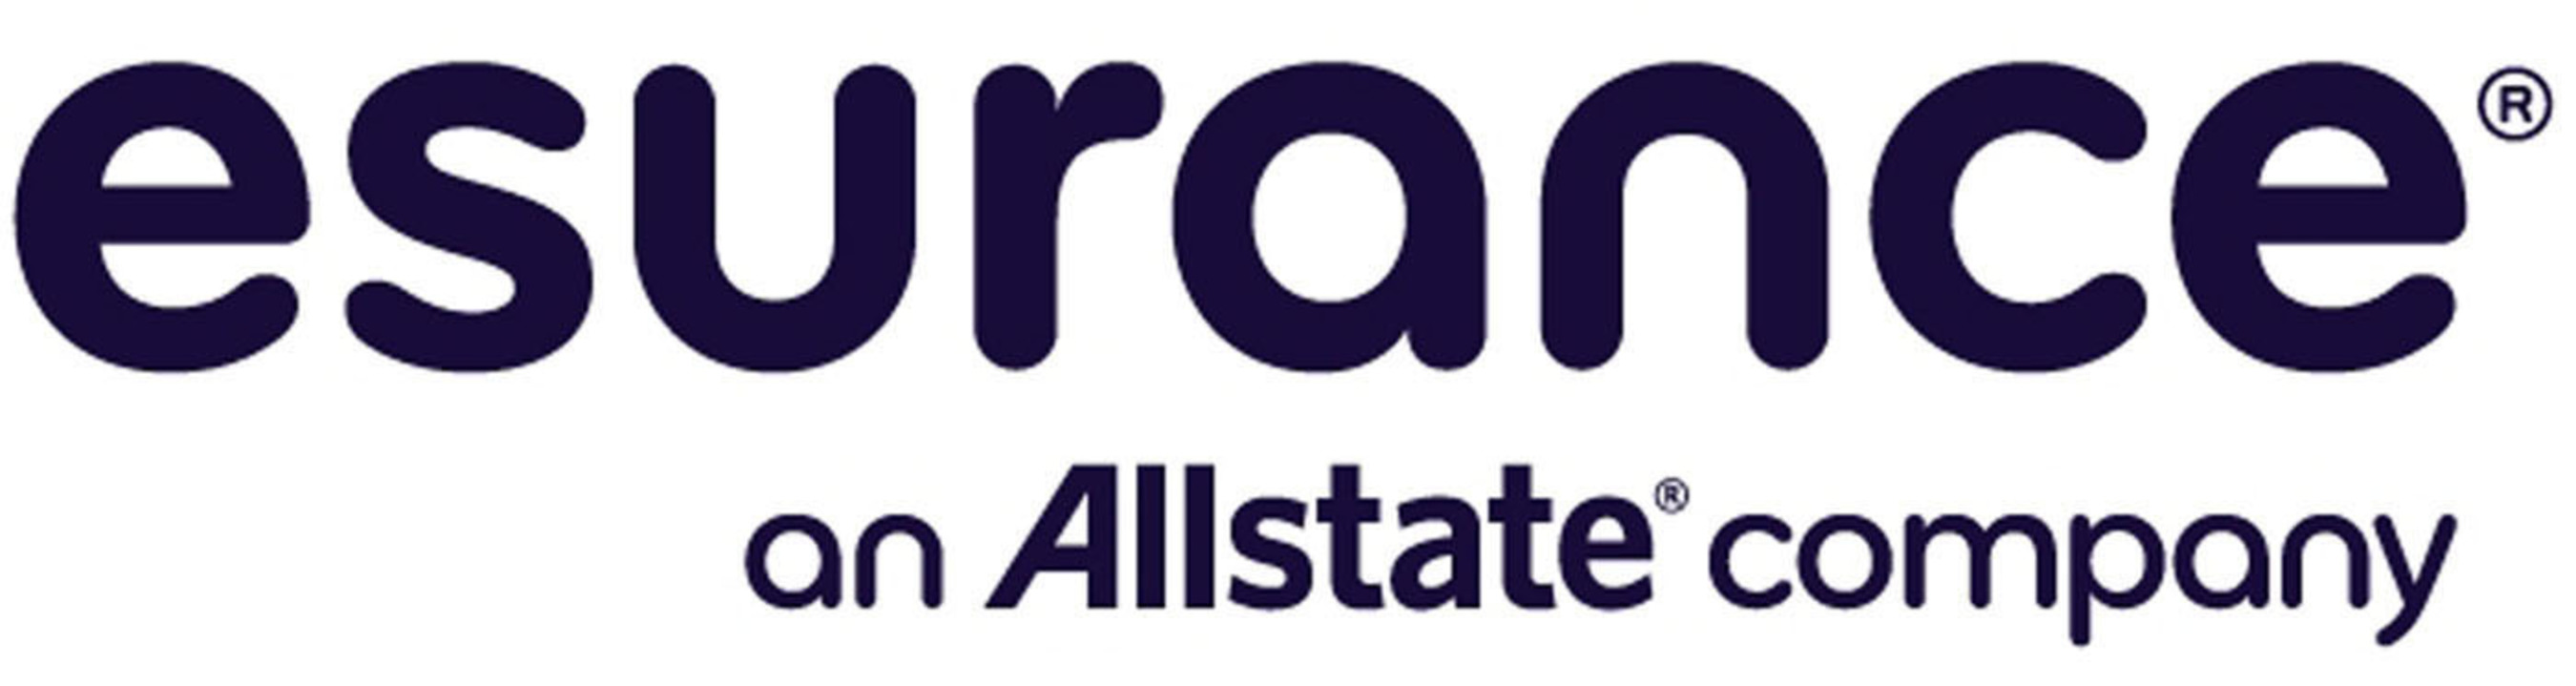 esurance an Allstate company Logo.